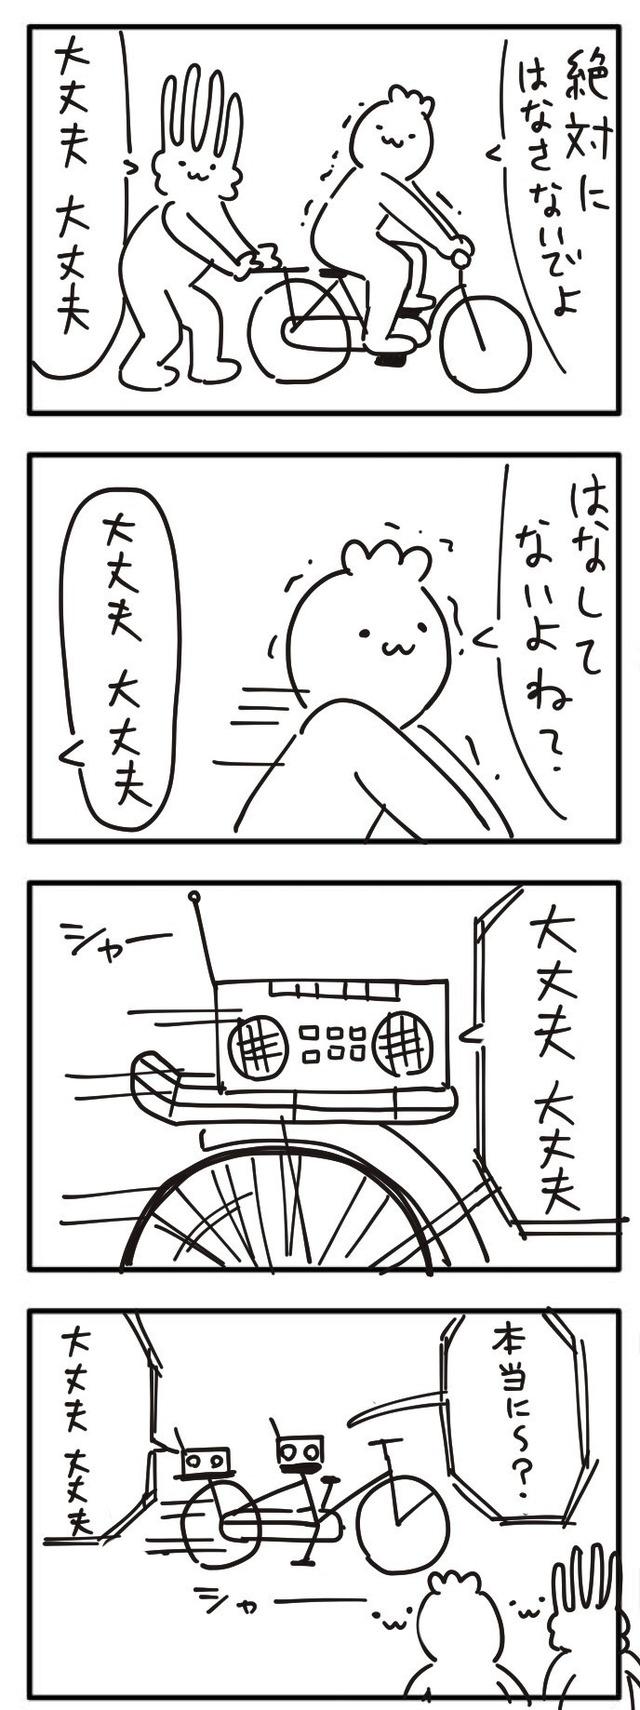 20140710100450_83_6